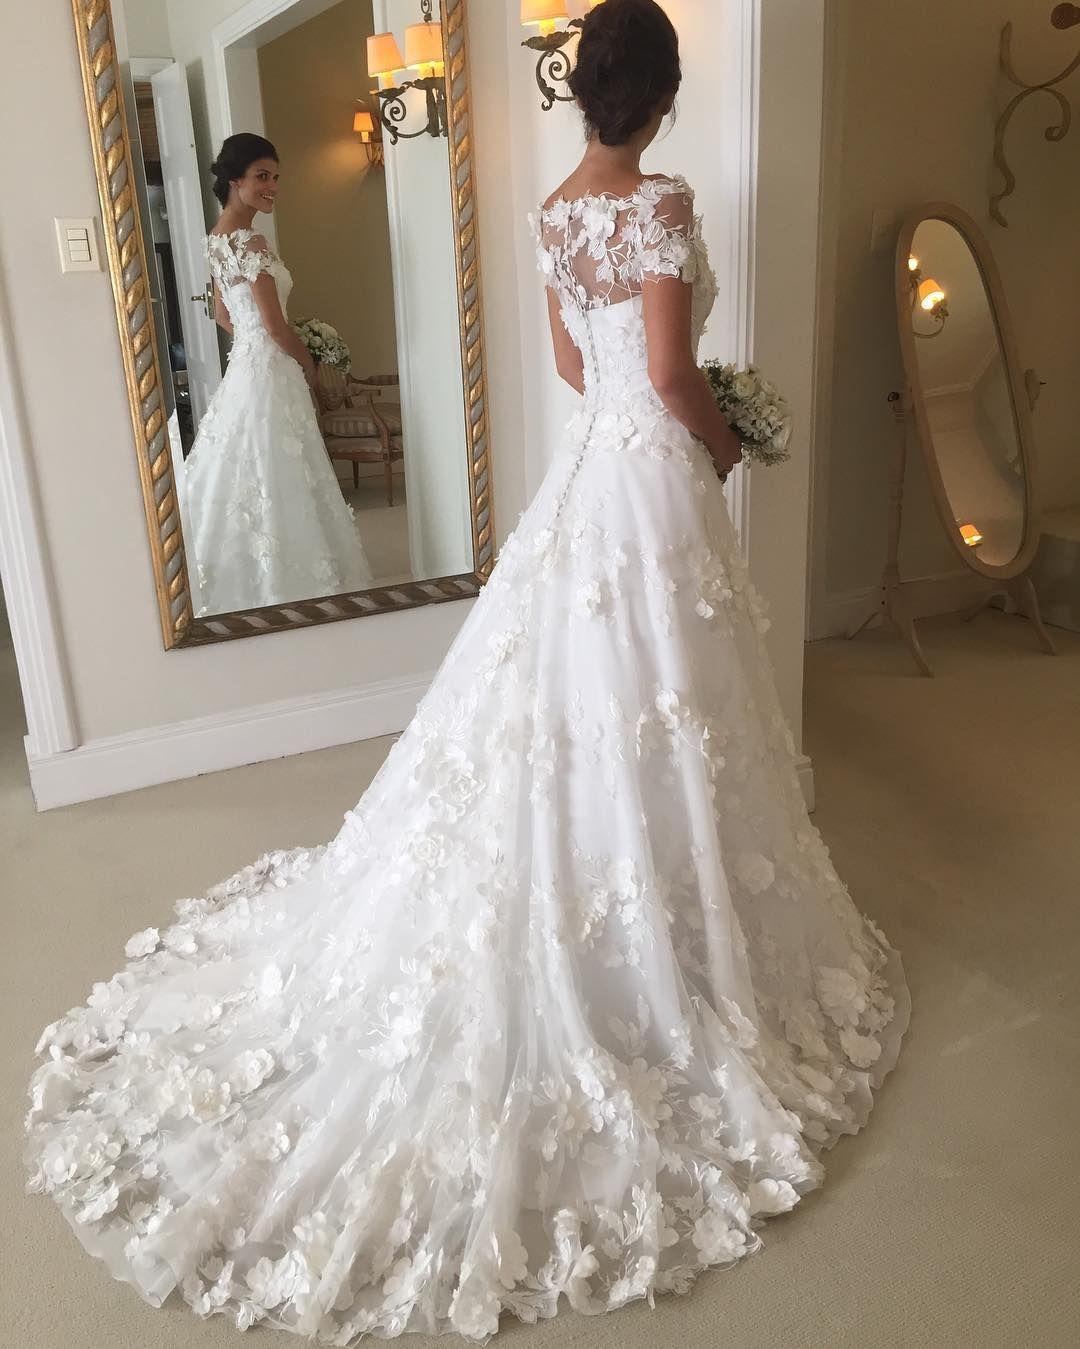 b271c8d4ee Latino Wedding Dress Designers | POPSUGAR Latina | HERE COMES THE ...